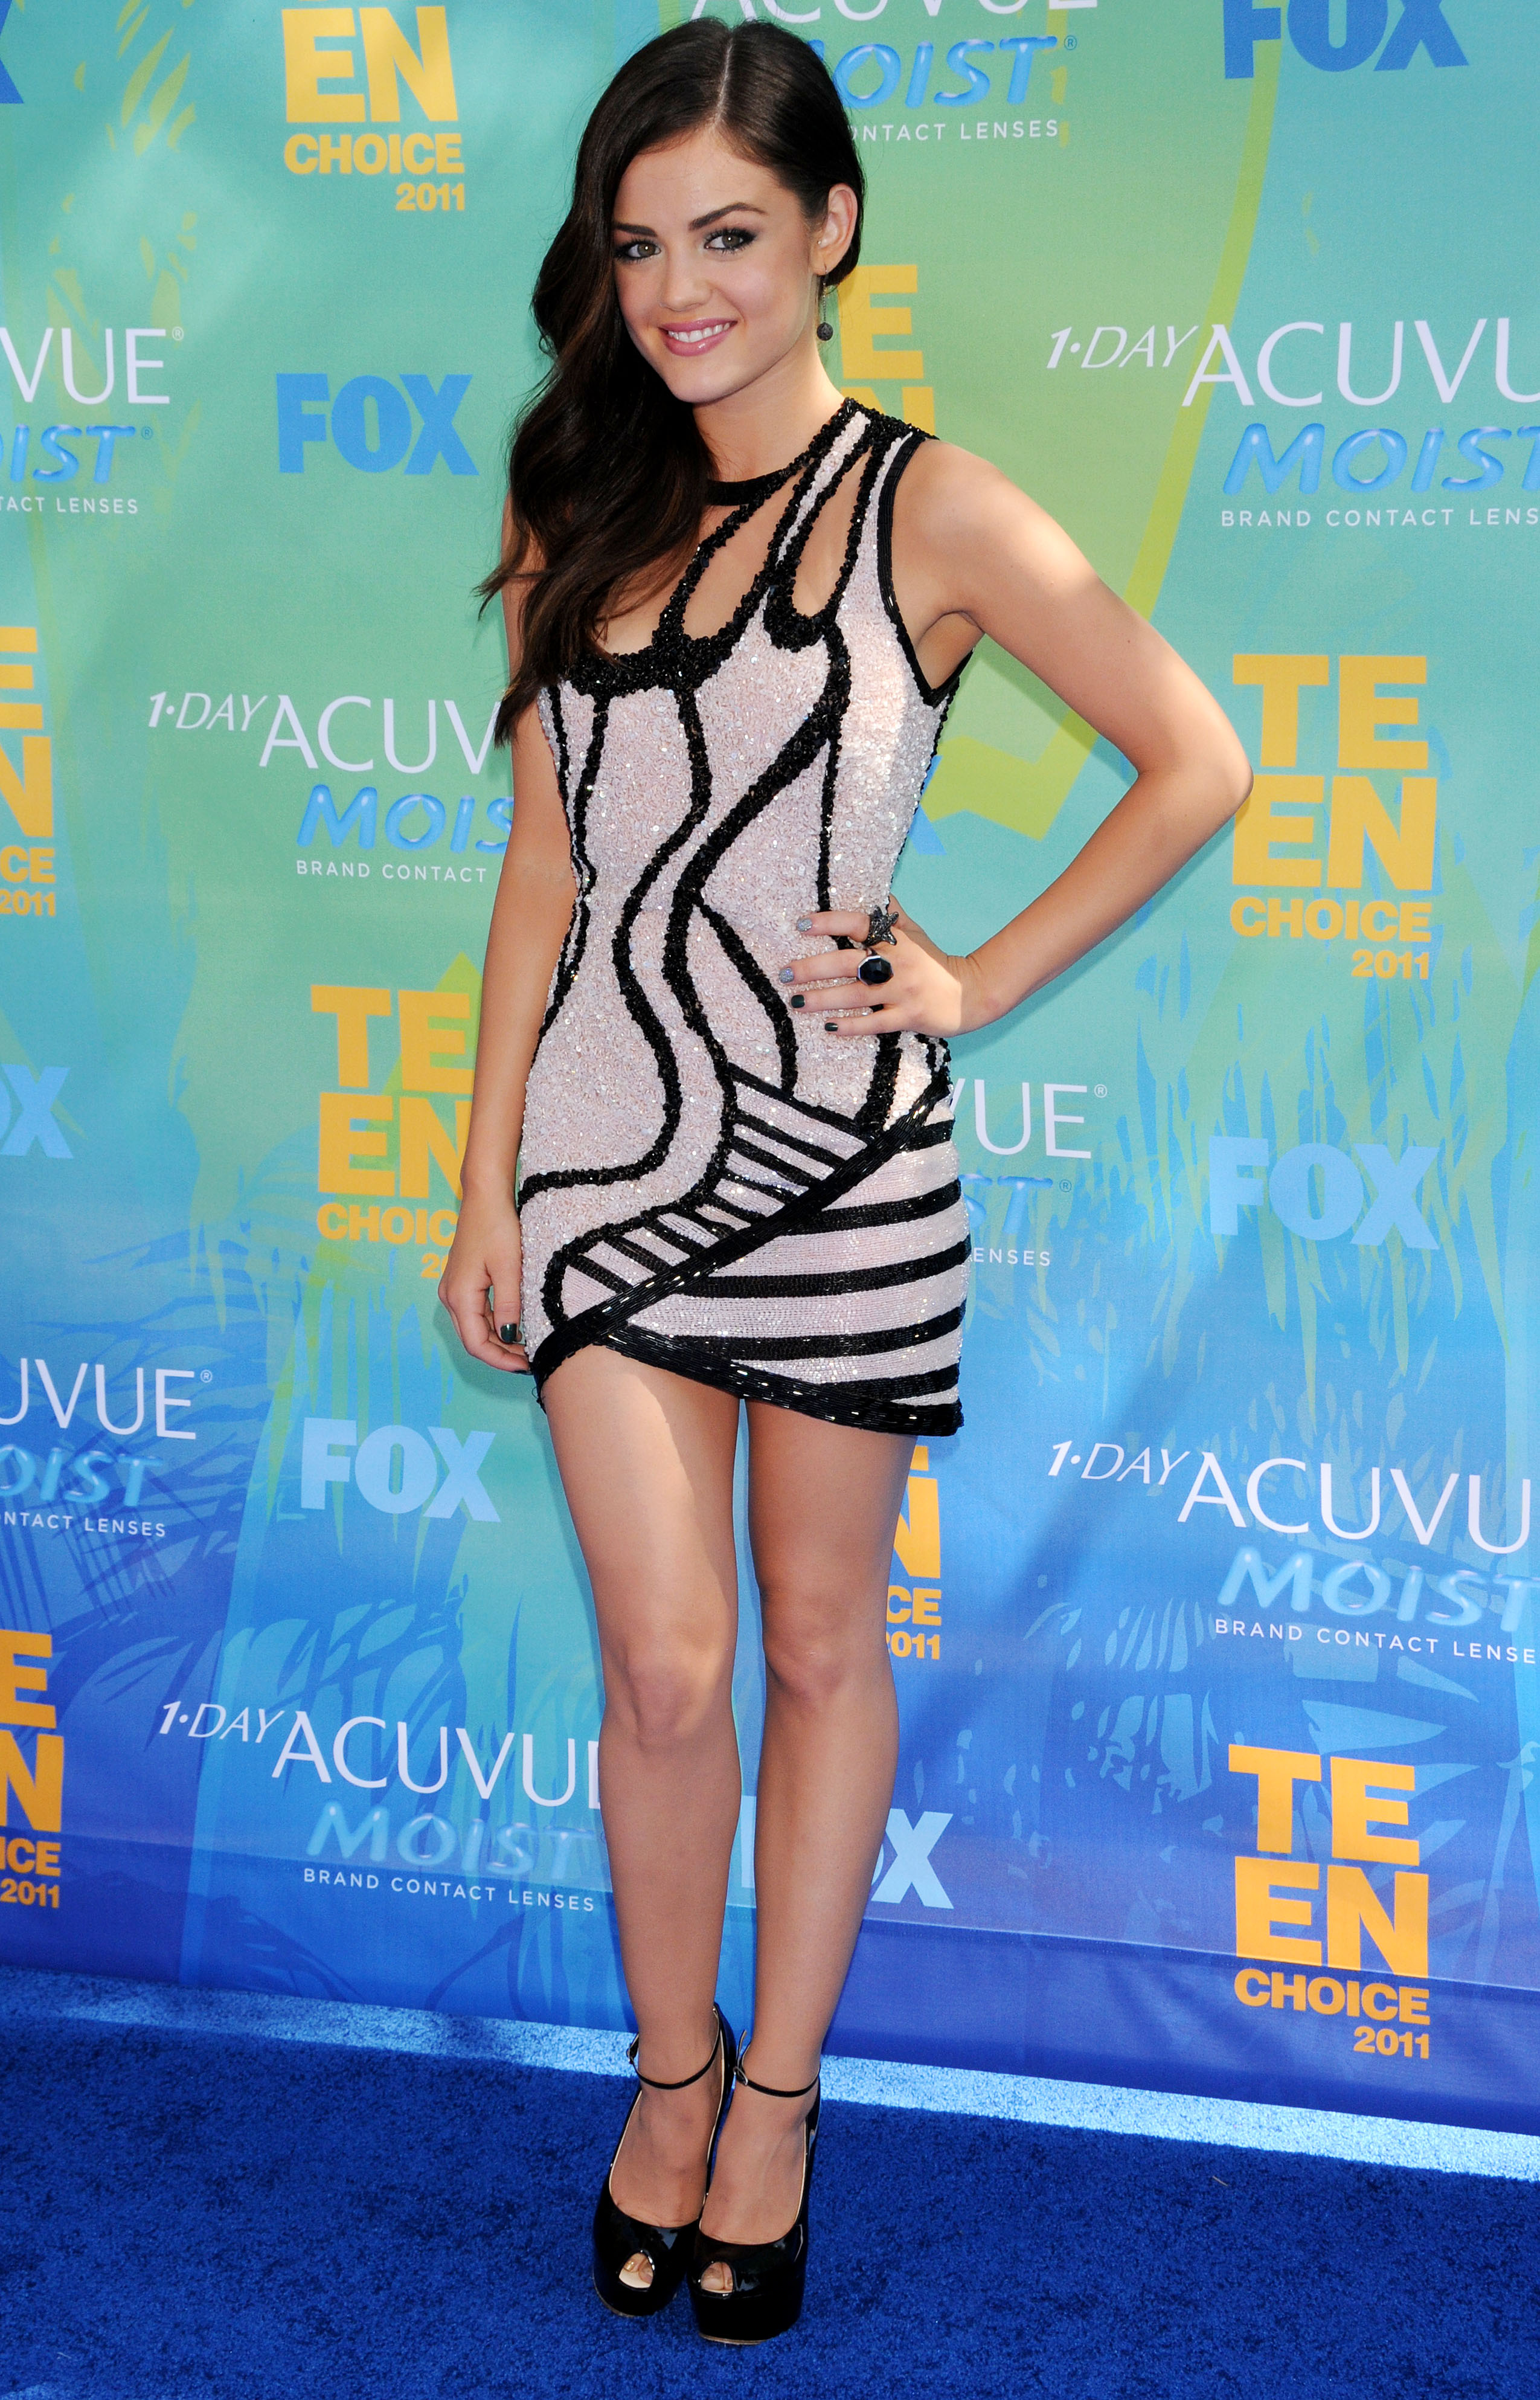 Blog: Teen Choice Awards - CBScom